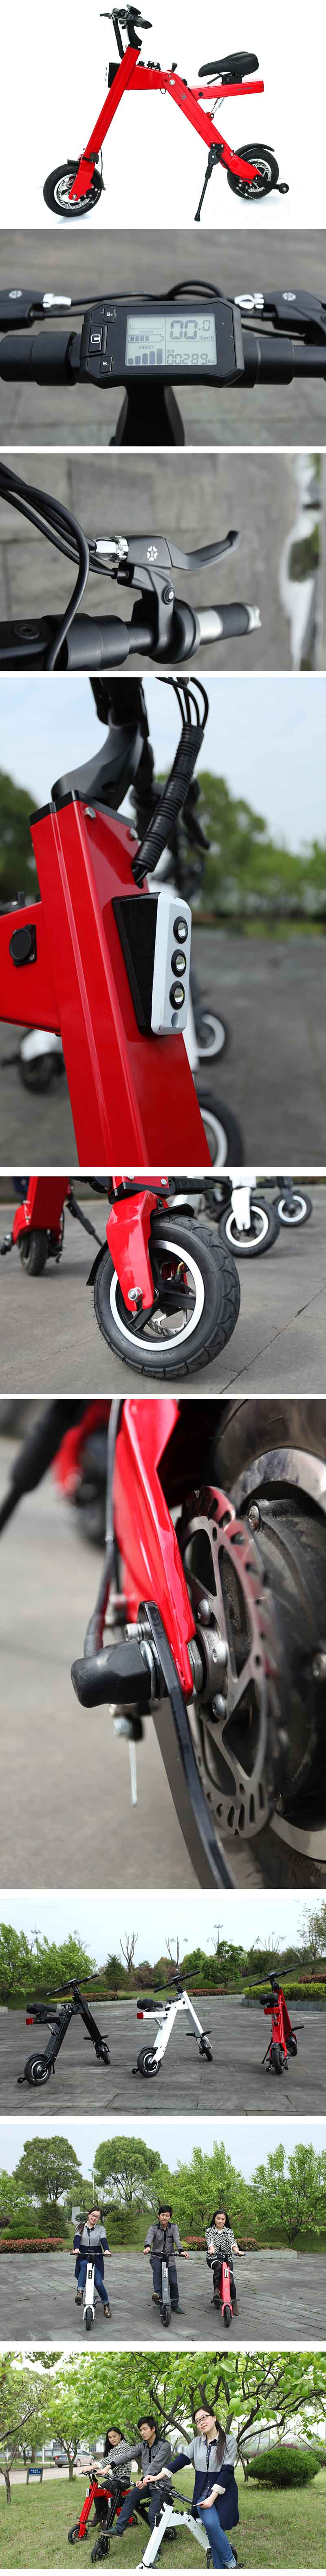 Wholesale Mini Foldable Scooter 250W Electric Bike